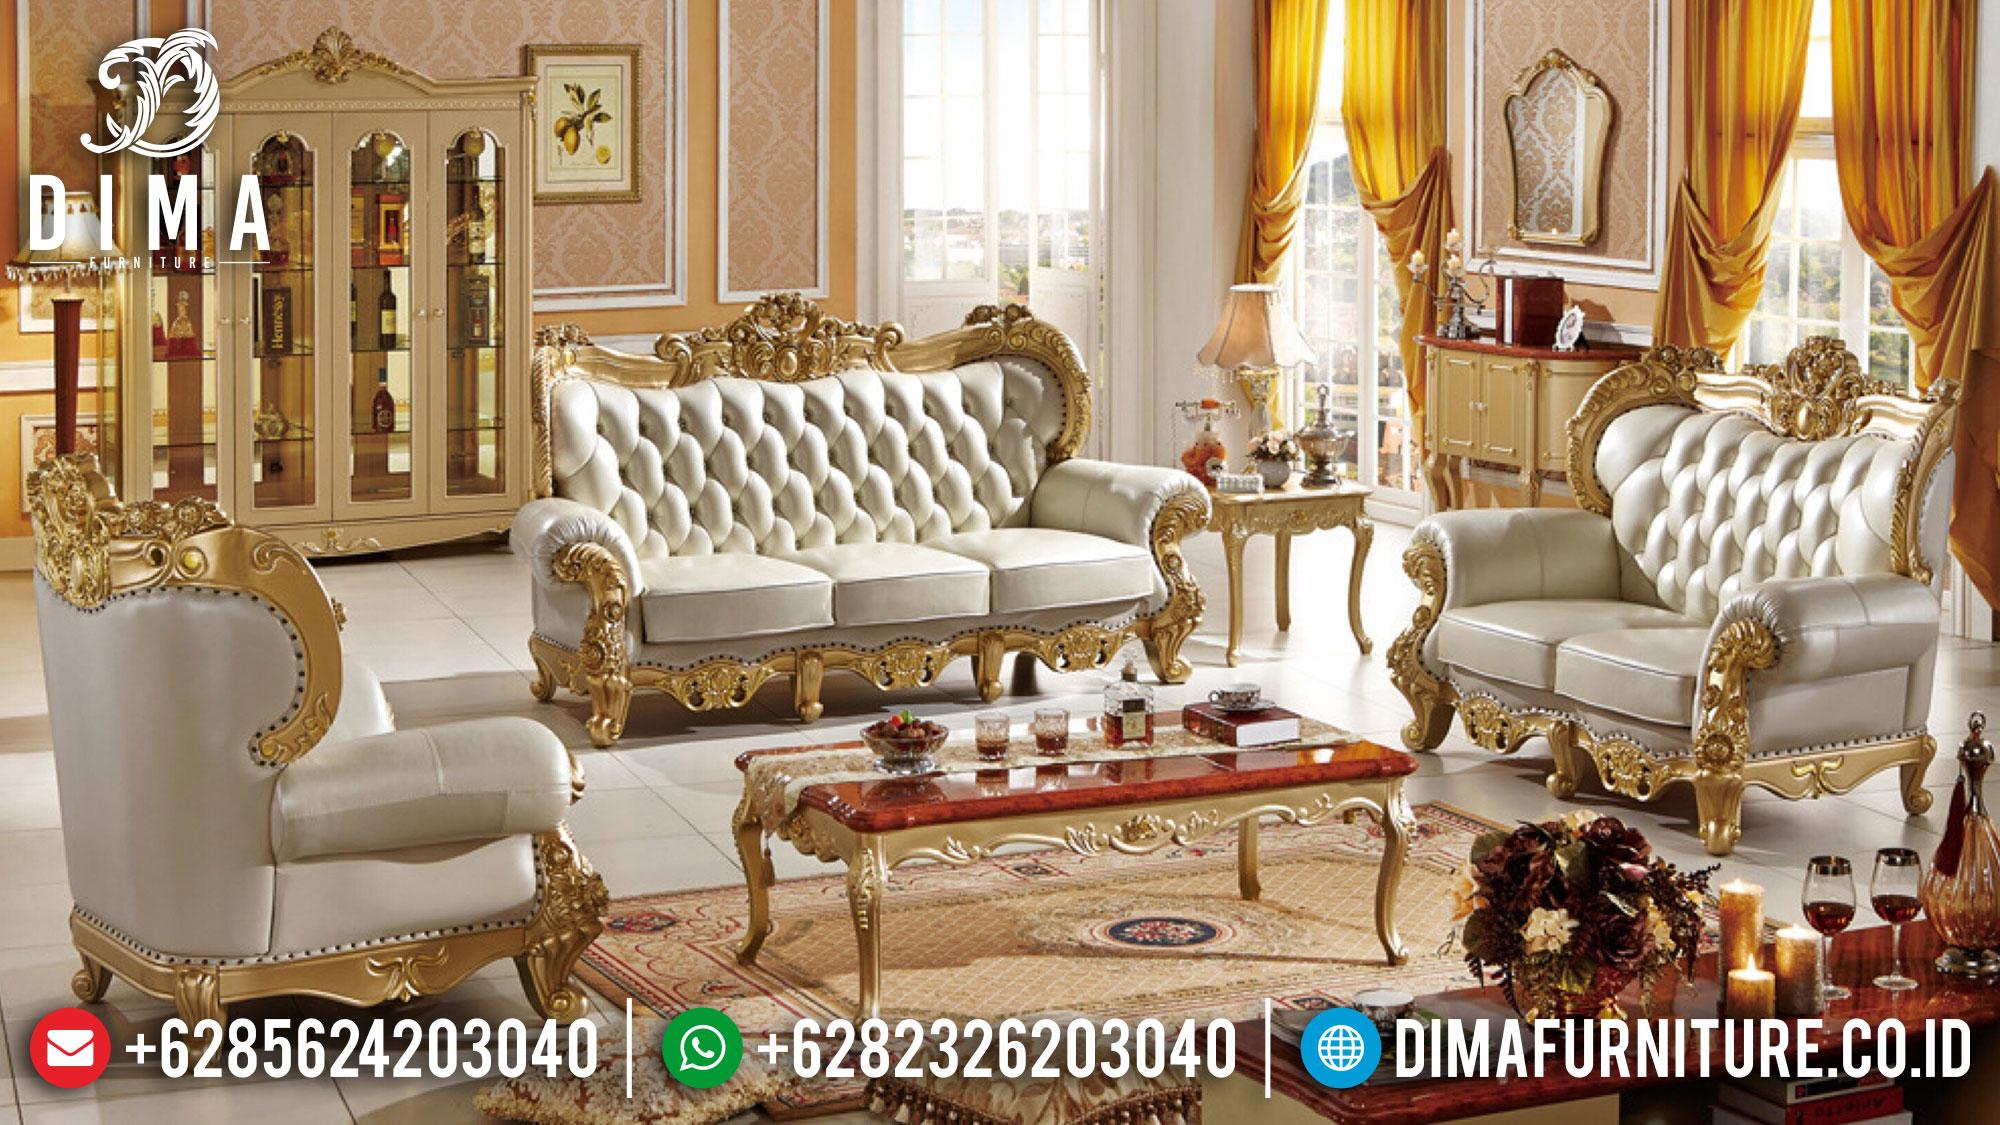 New Set Sofa Tamu Mewah Jepara Luxury Golden Shine Duco Color ST-1317